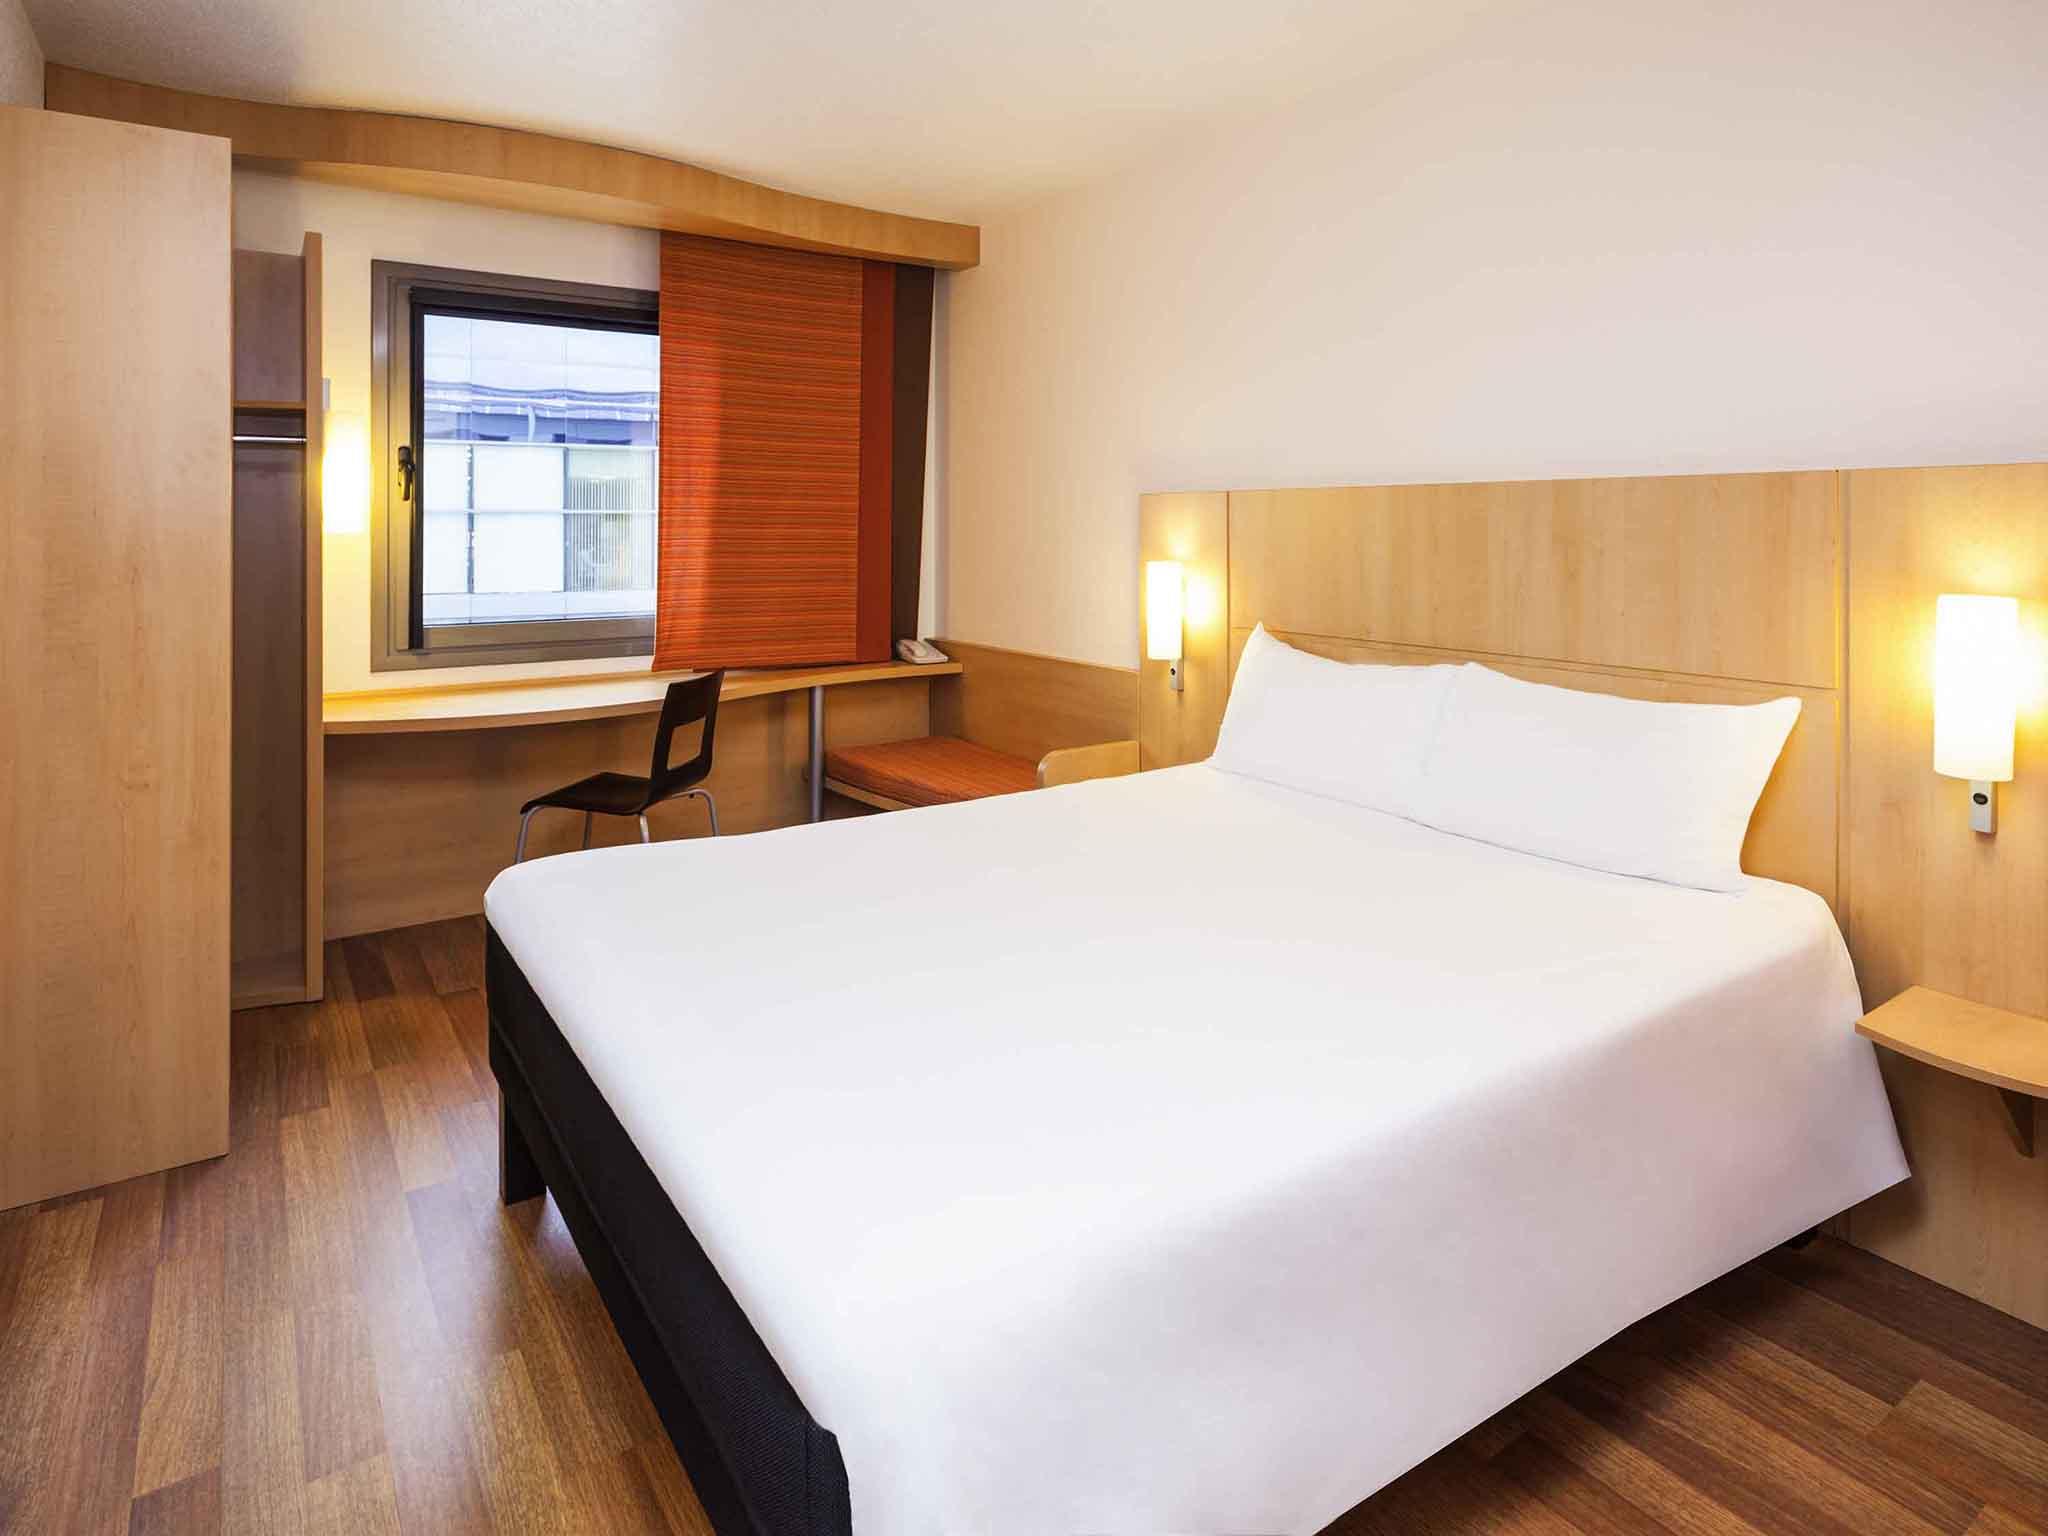 Alquiler de habitacion en alcobendas affordable alquiler for Compartir piso alcobendas